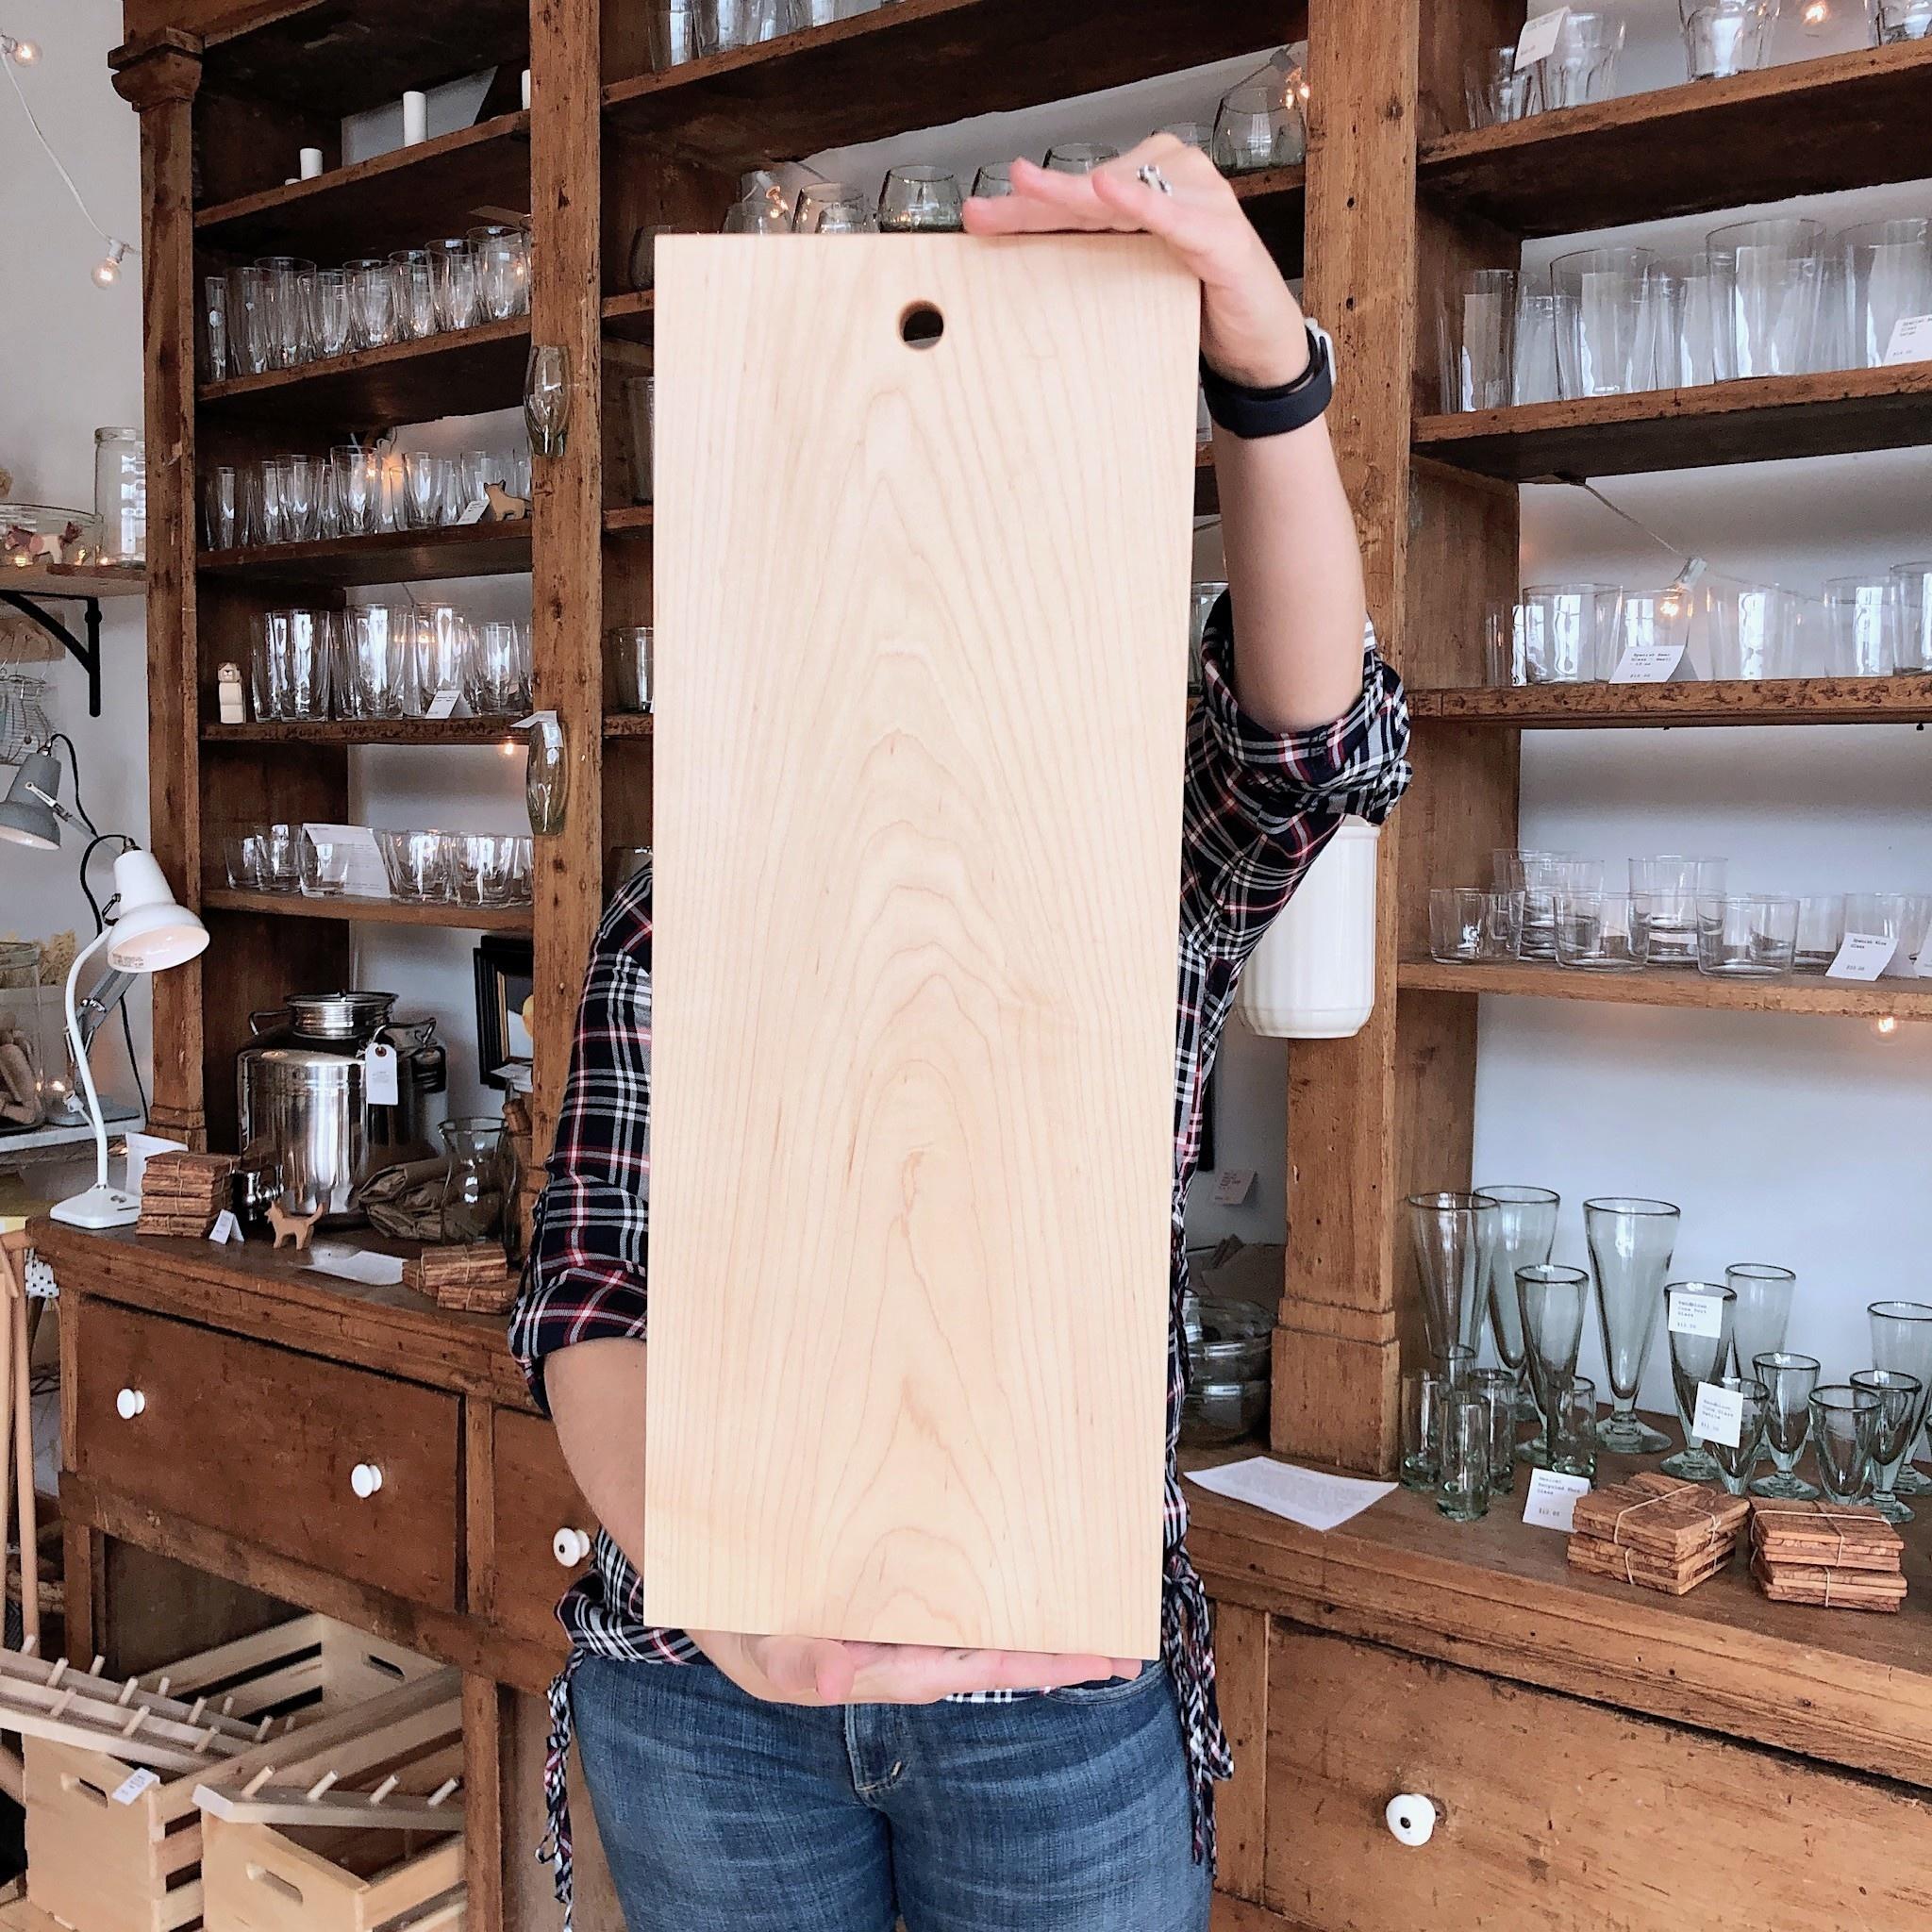 "Mara Metz Mara Metz Giant Charcuterie Board - 9"" x 24"""